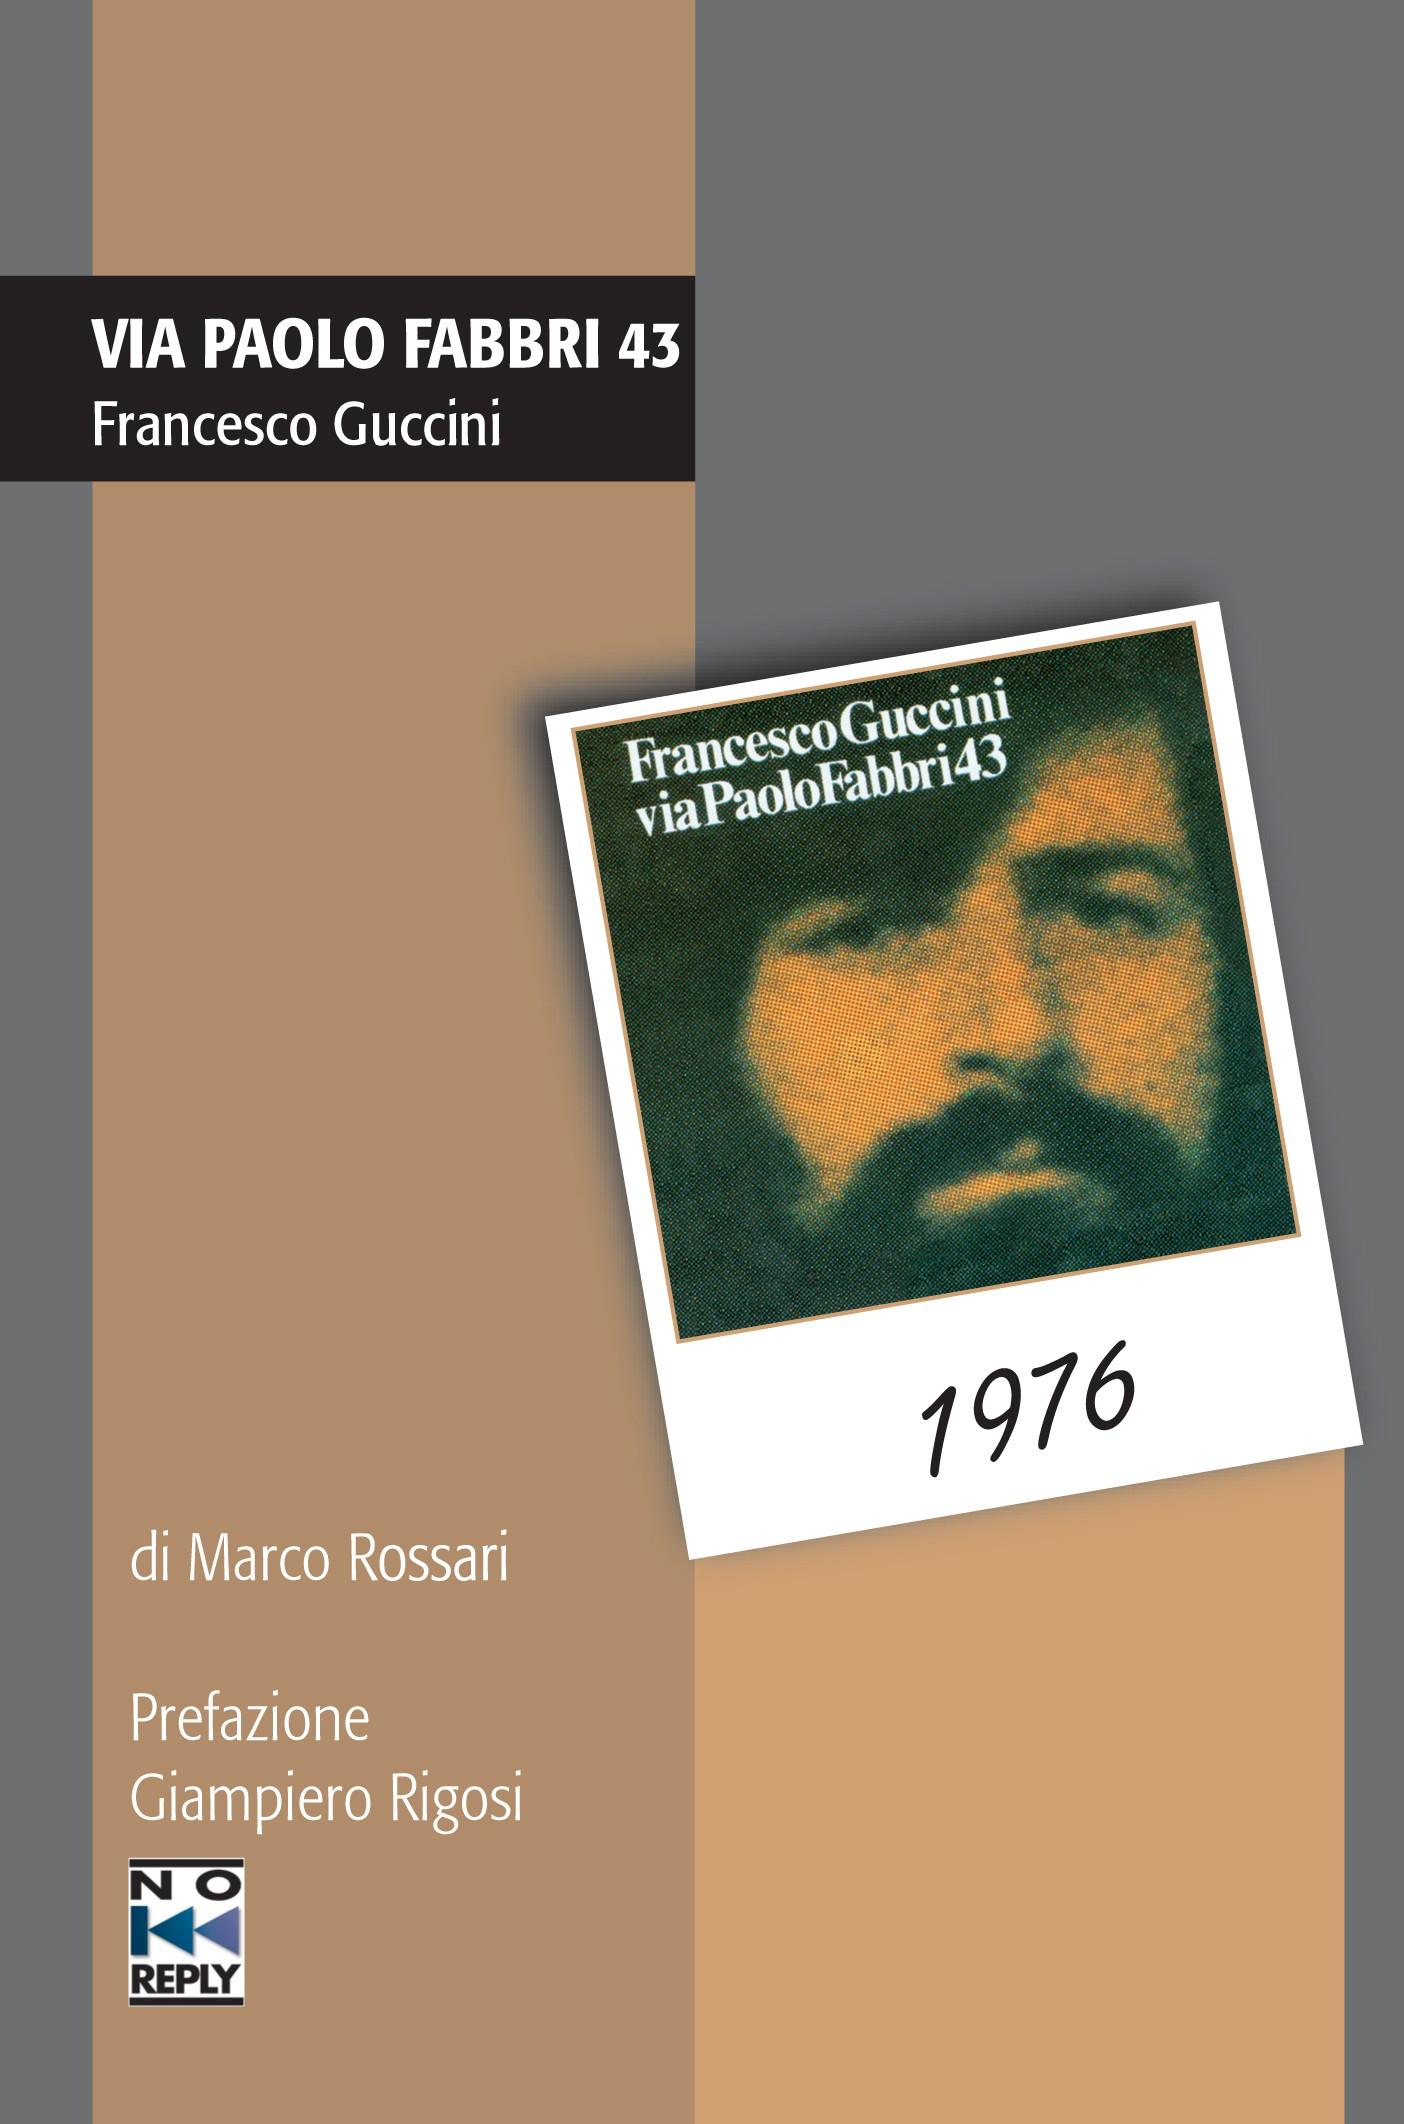 Book Cover Images Api ~ Via paolo fabbri francesco guccini marco rossari